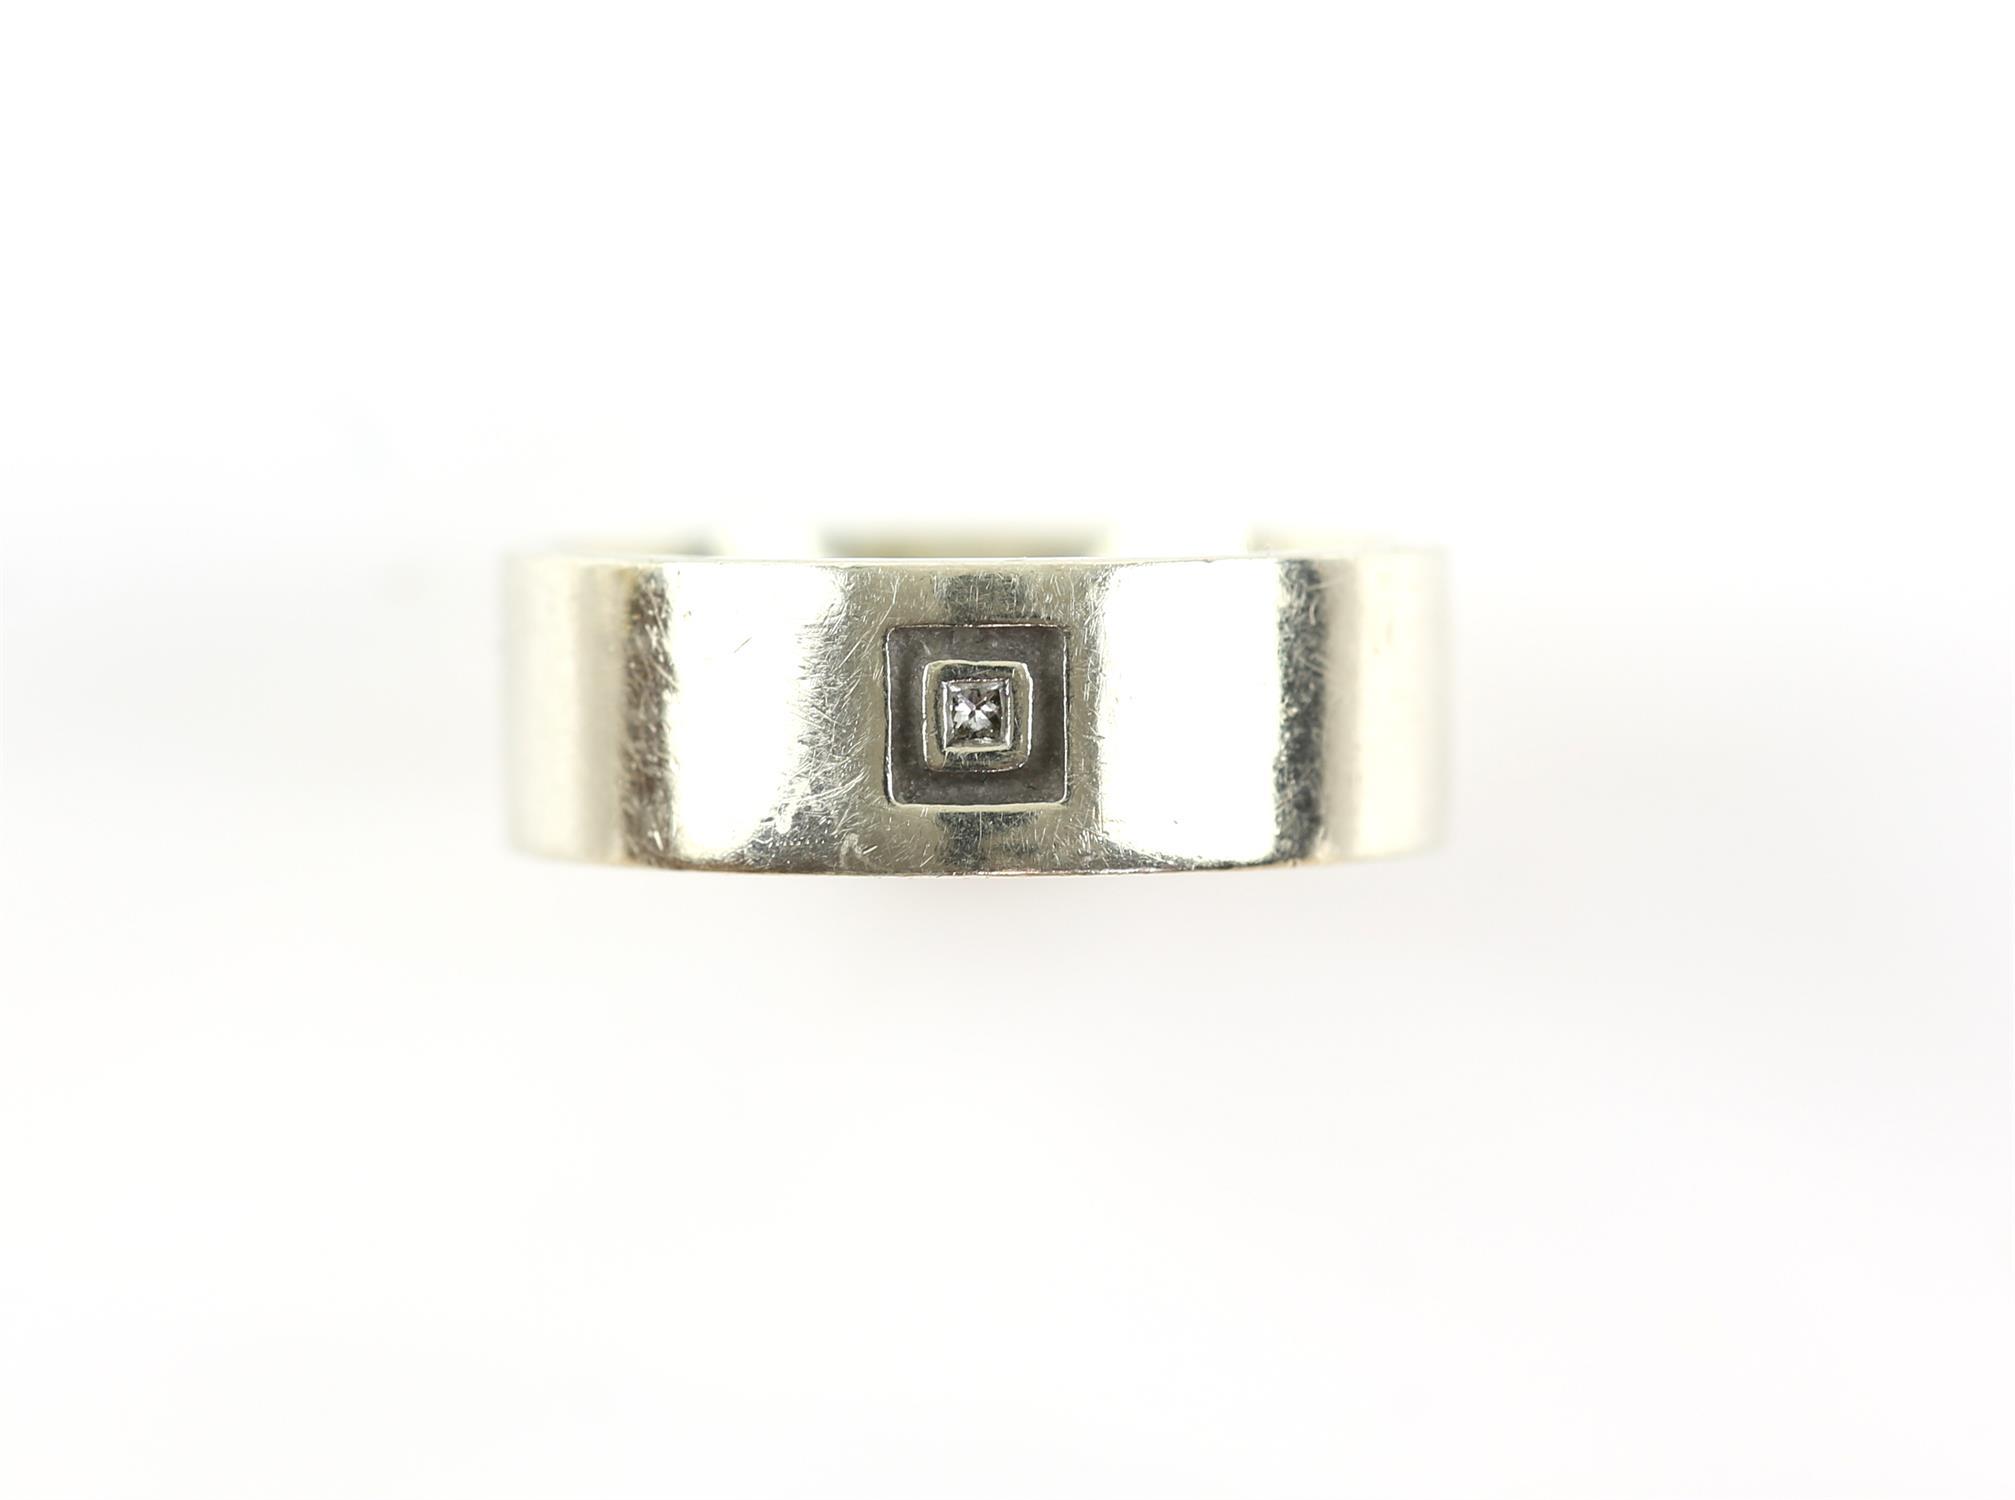 Single stone diamond wedding band, 7.25mm band, hallmarked 9 ct, London, with makers mark RJ,